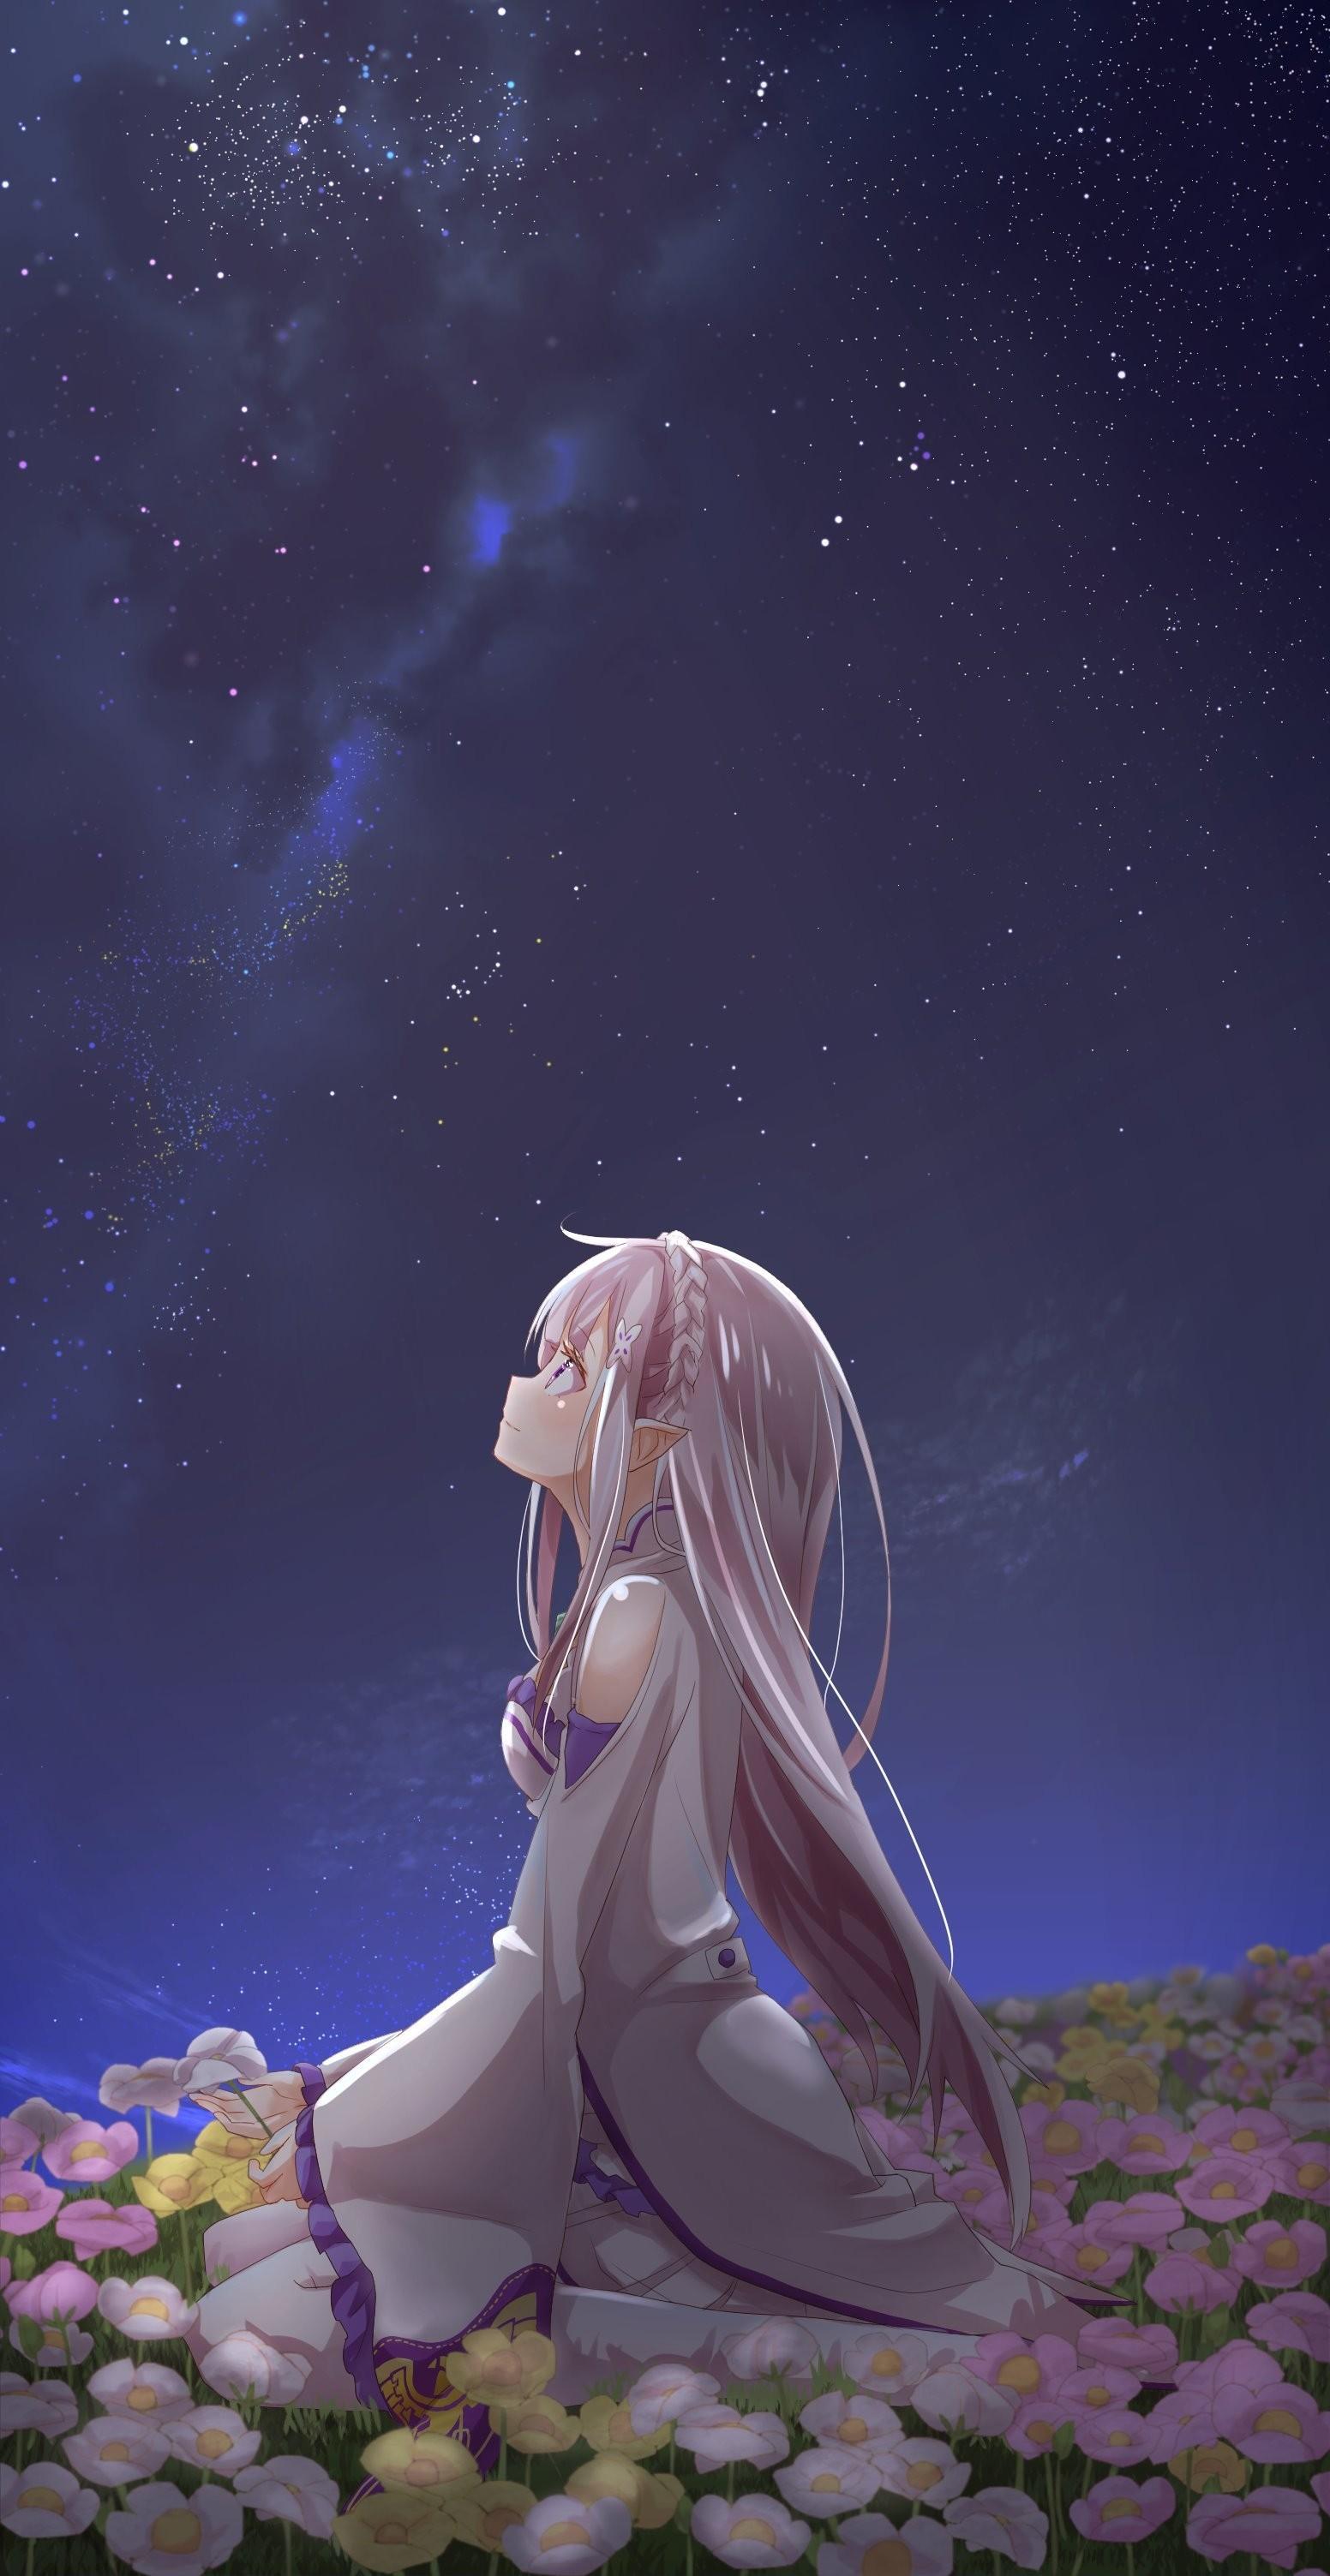 17 Wallpaper Anime Reddit Anime Wallpaper 16 anime wallpapers reddit